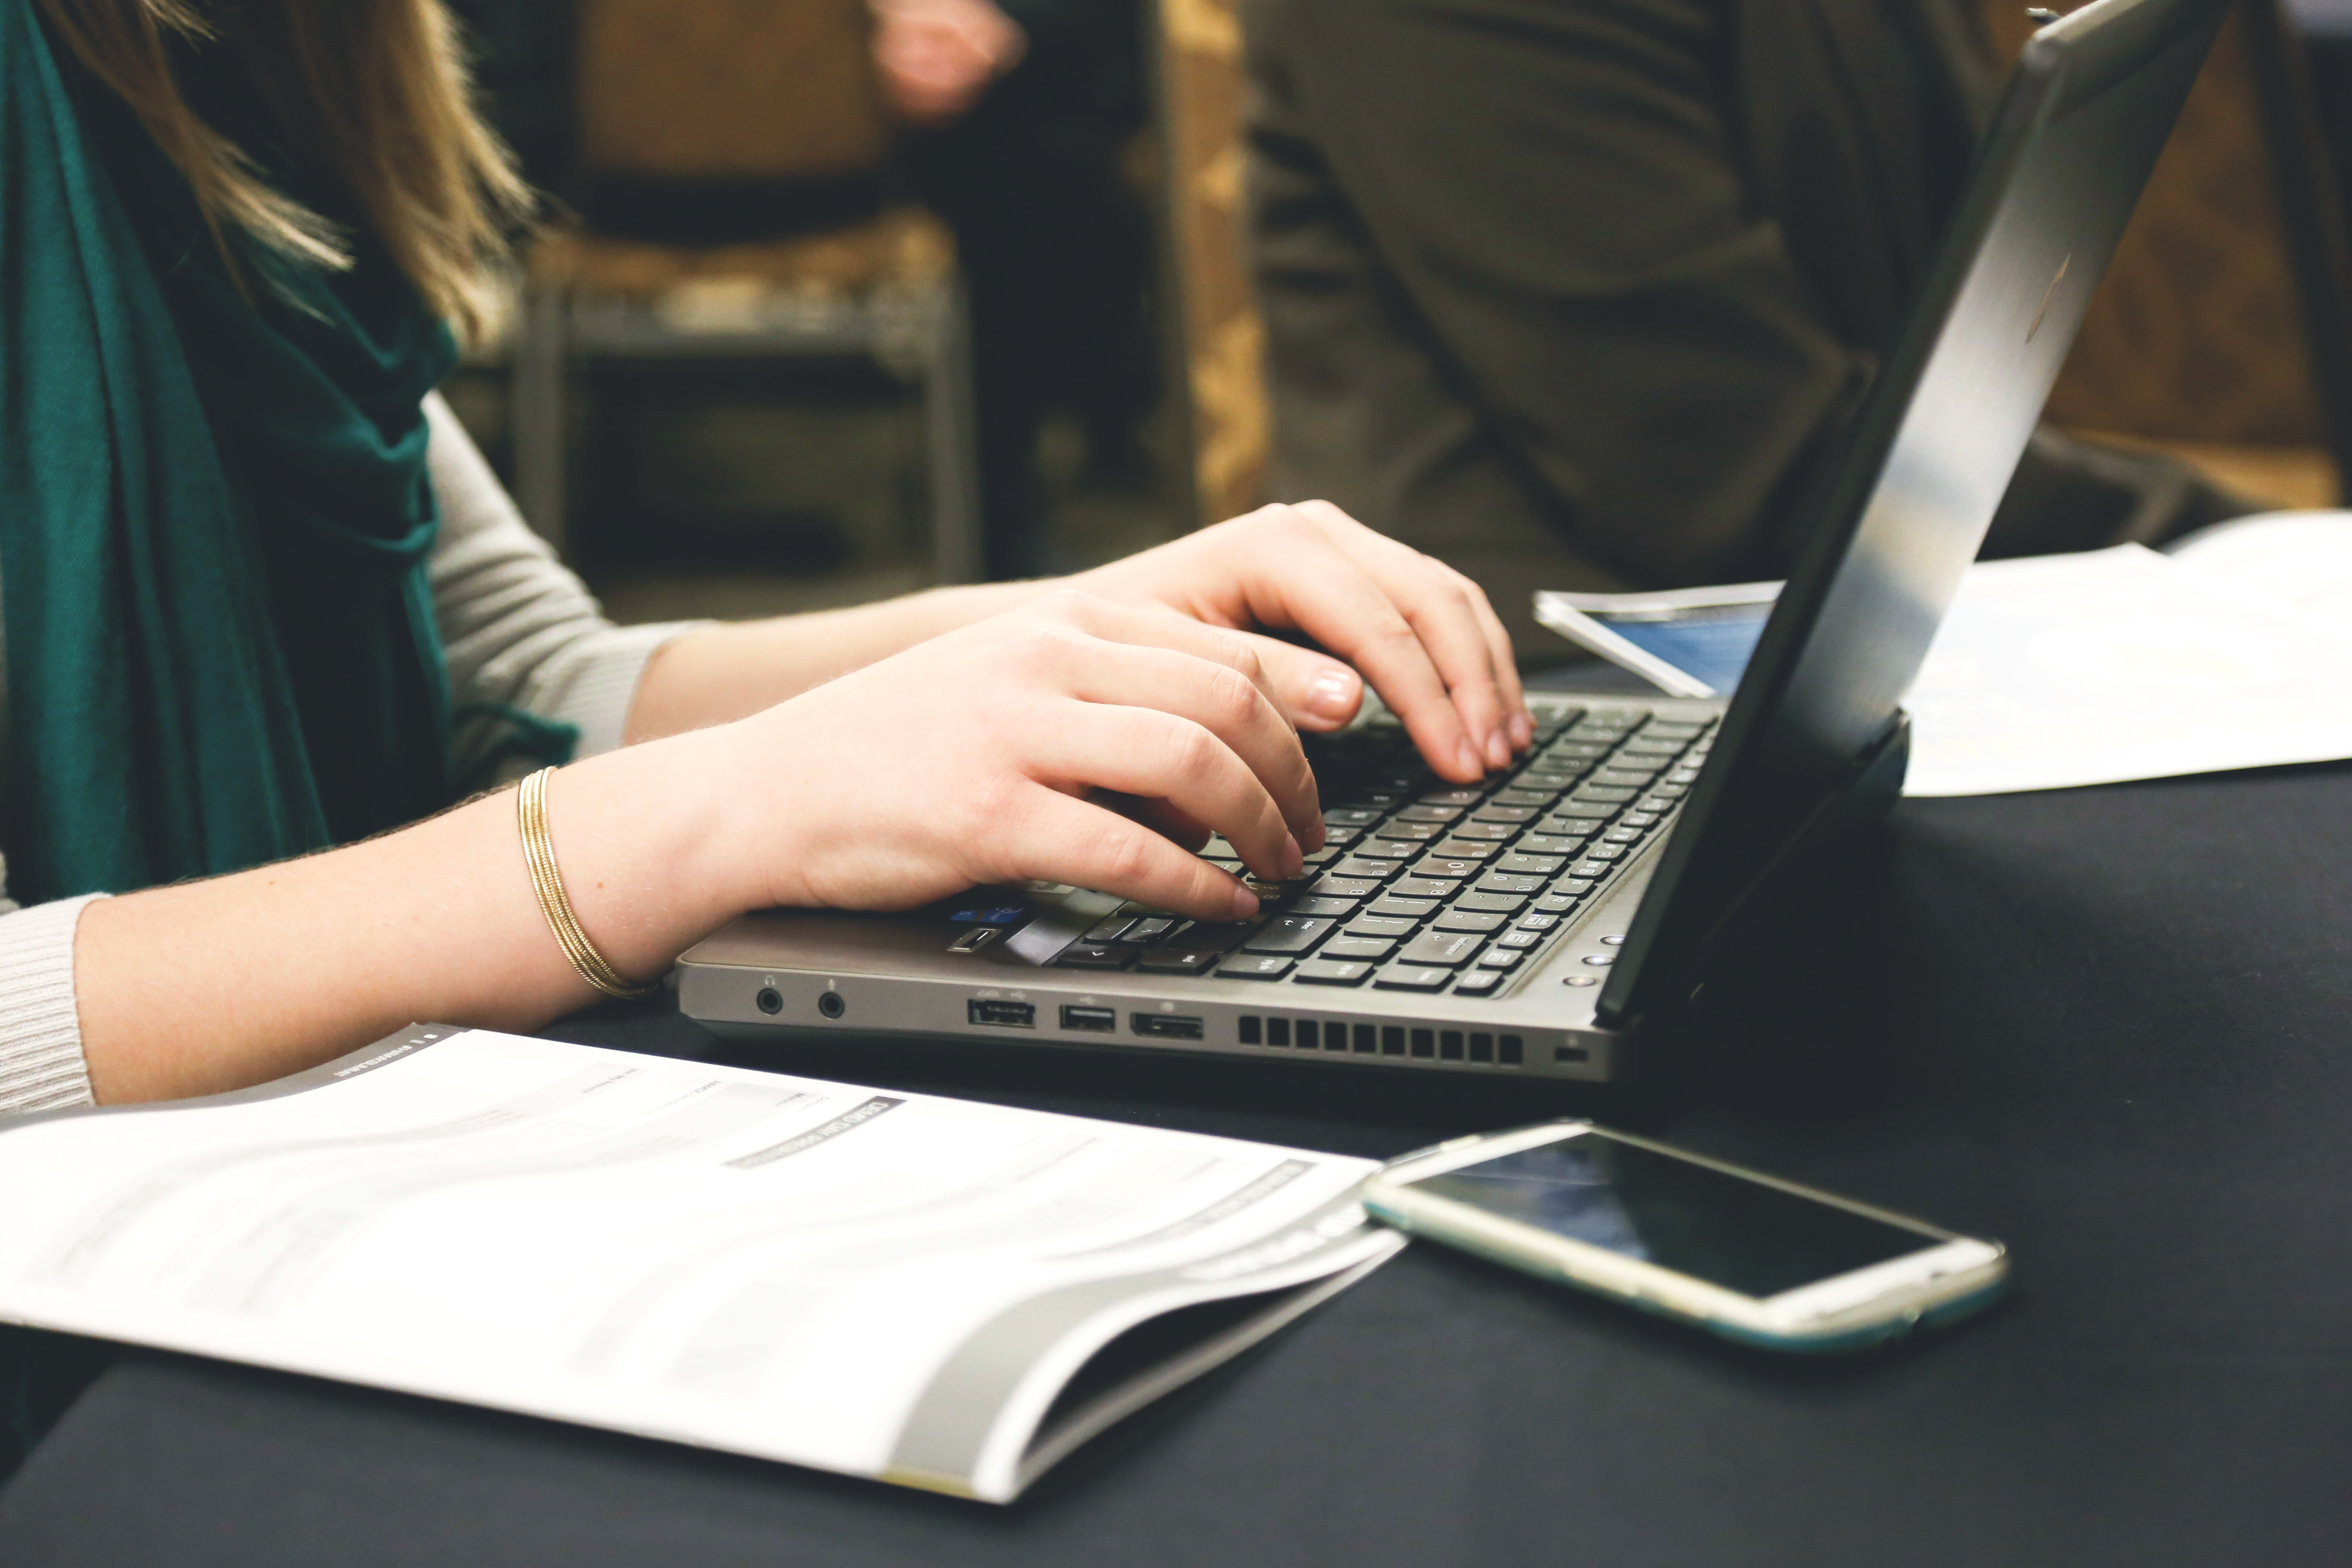 Argumentative essay on computers internet boon or bane